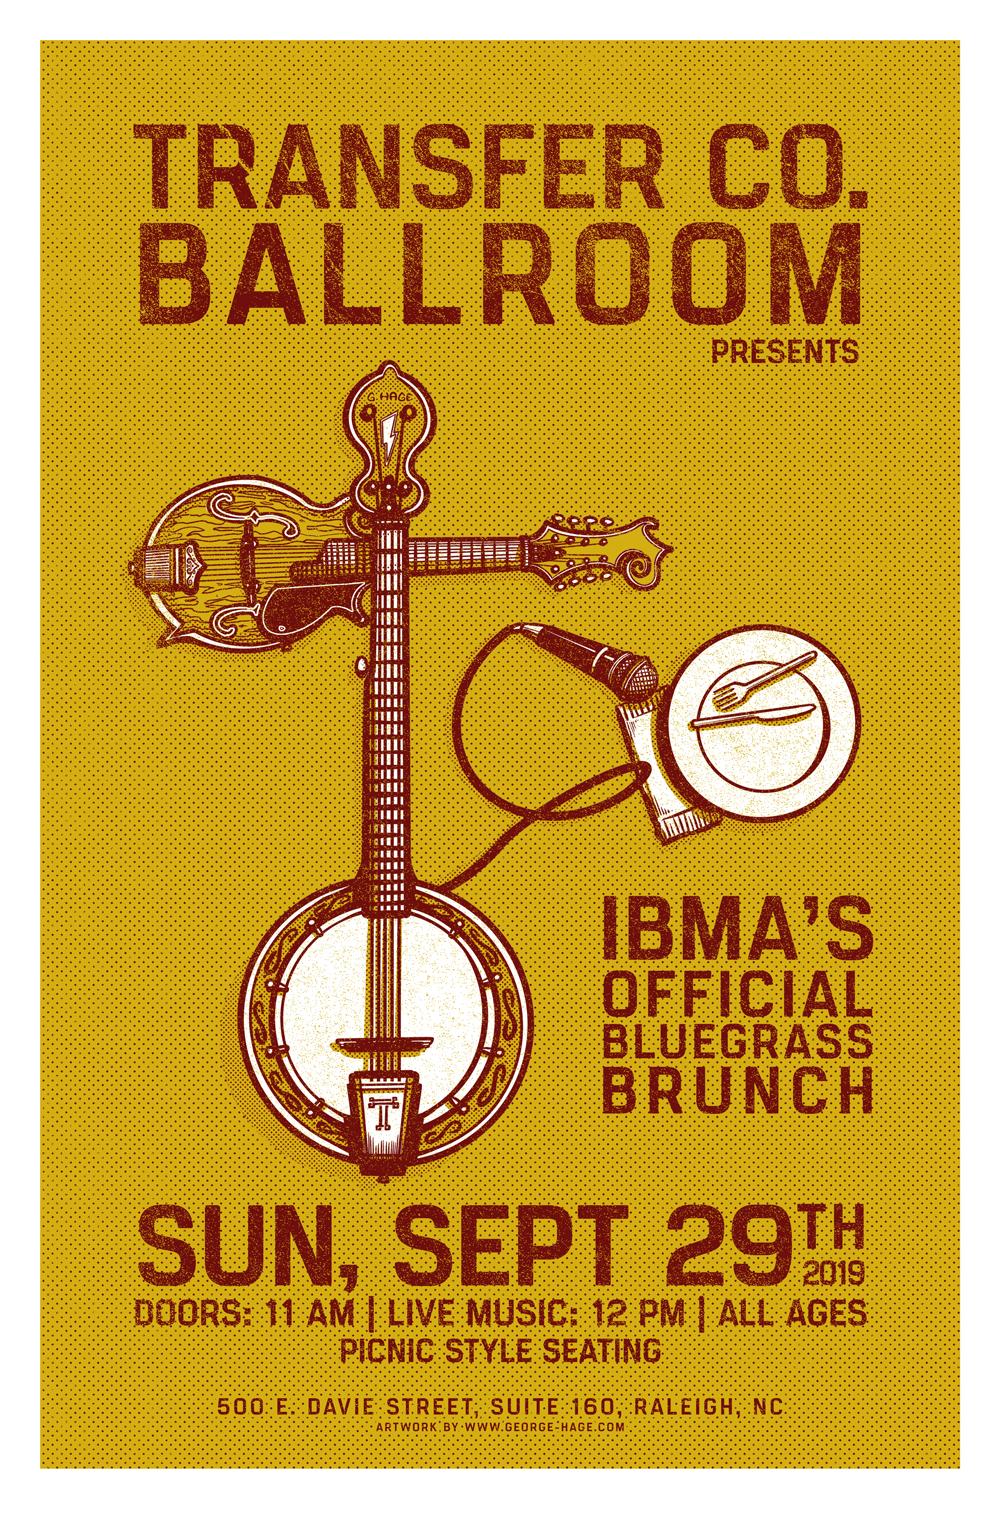 TransferCoBallroom_IBMA_Poster_Upate-FINAL-WEB.jpg